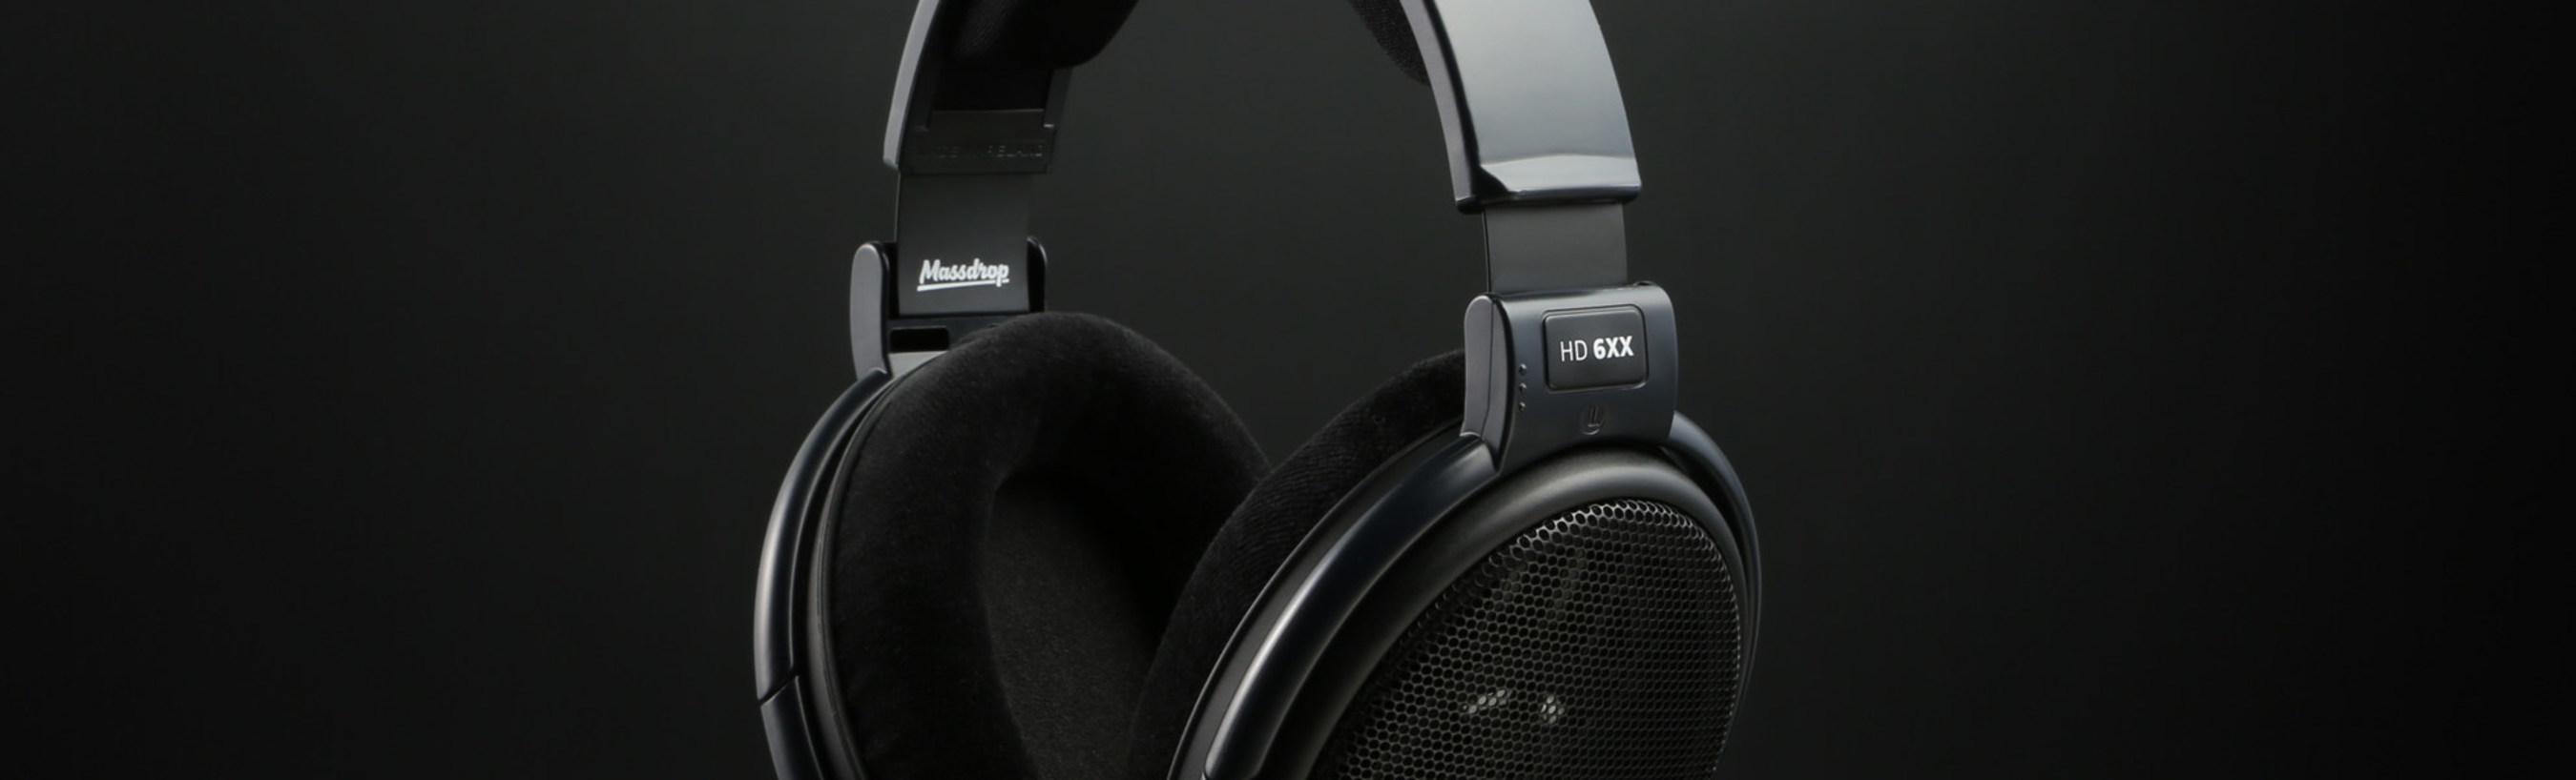 Massdrop Collaborates with Sennheiser on HD6XX Headphones